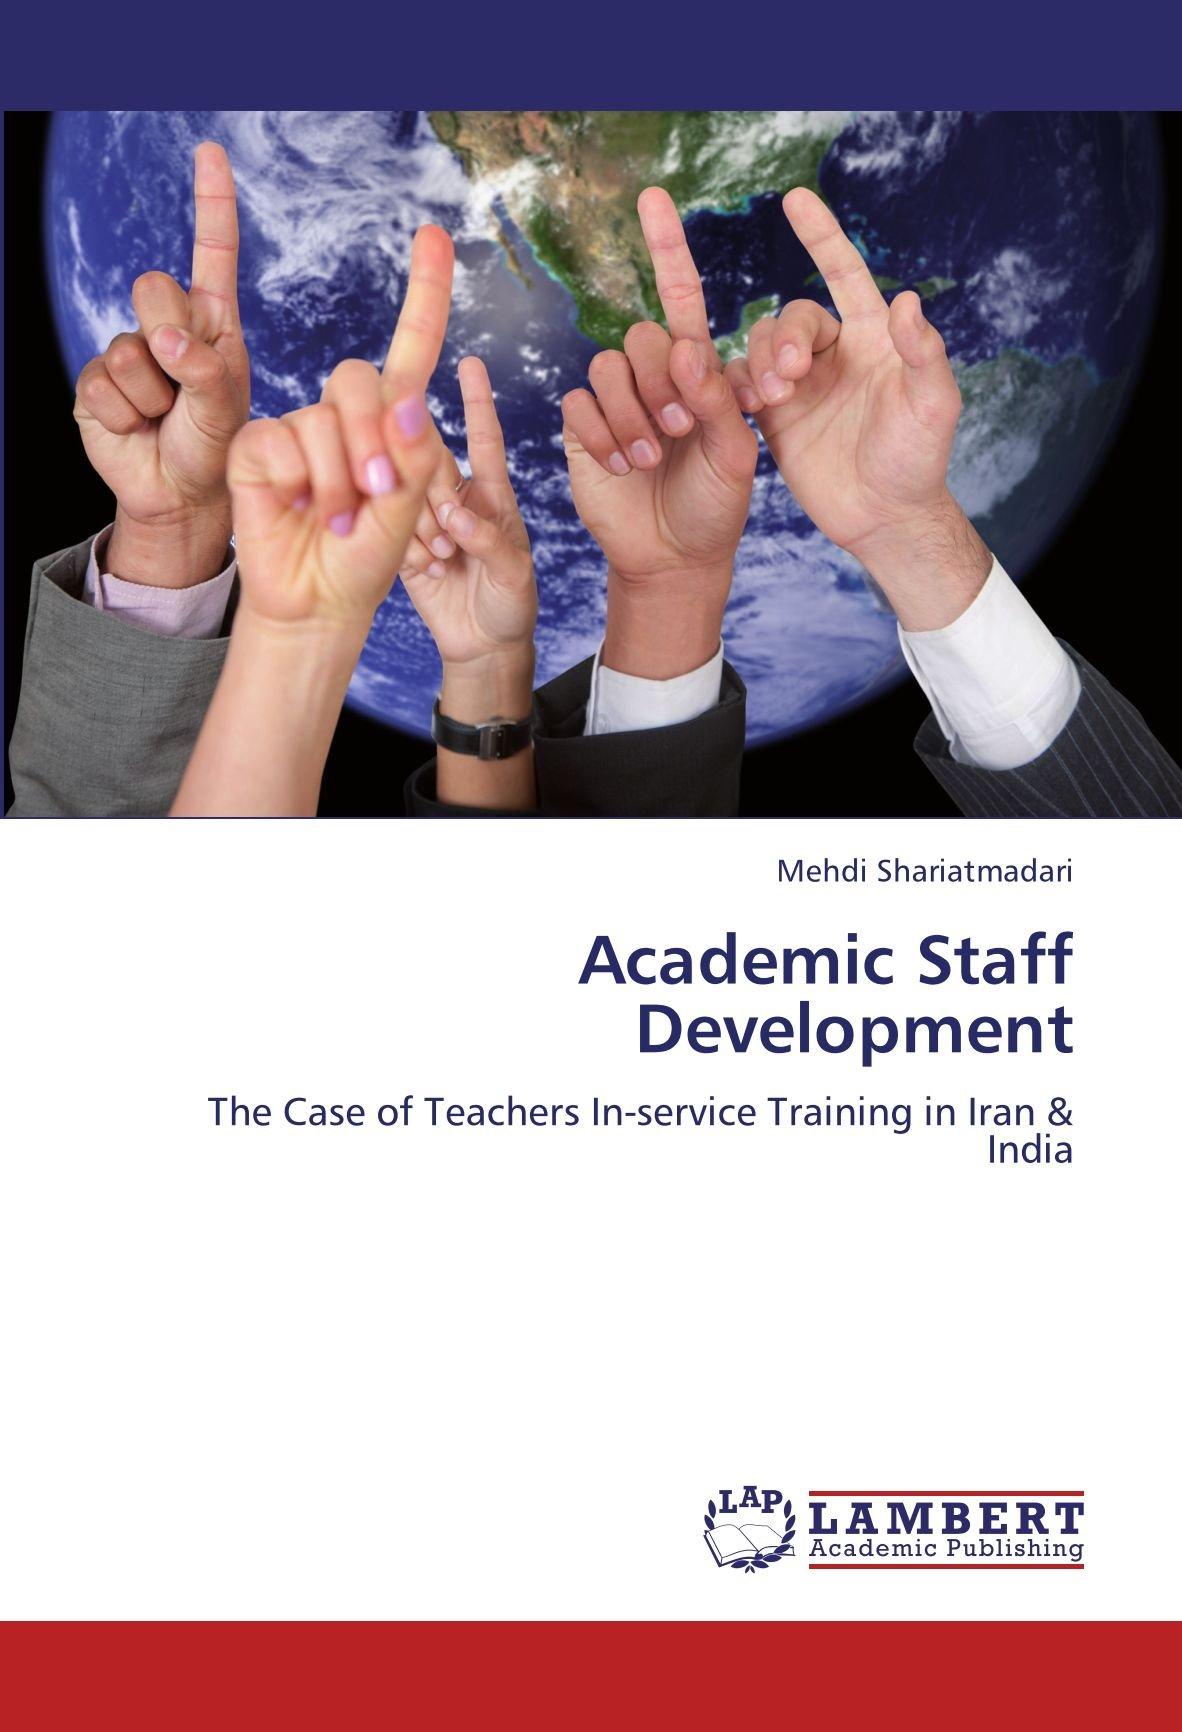 Academic Staff Development: The Case of Teachers In-service Training in Iran & India ebook